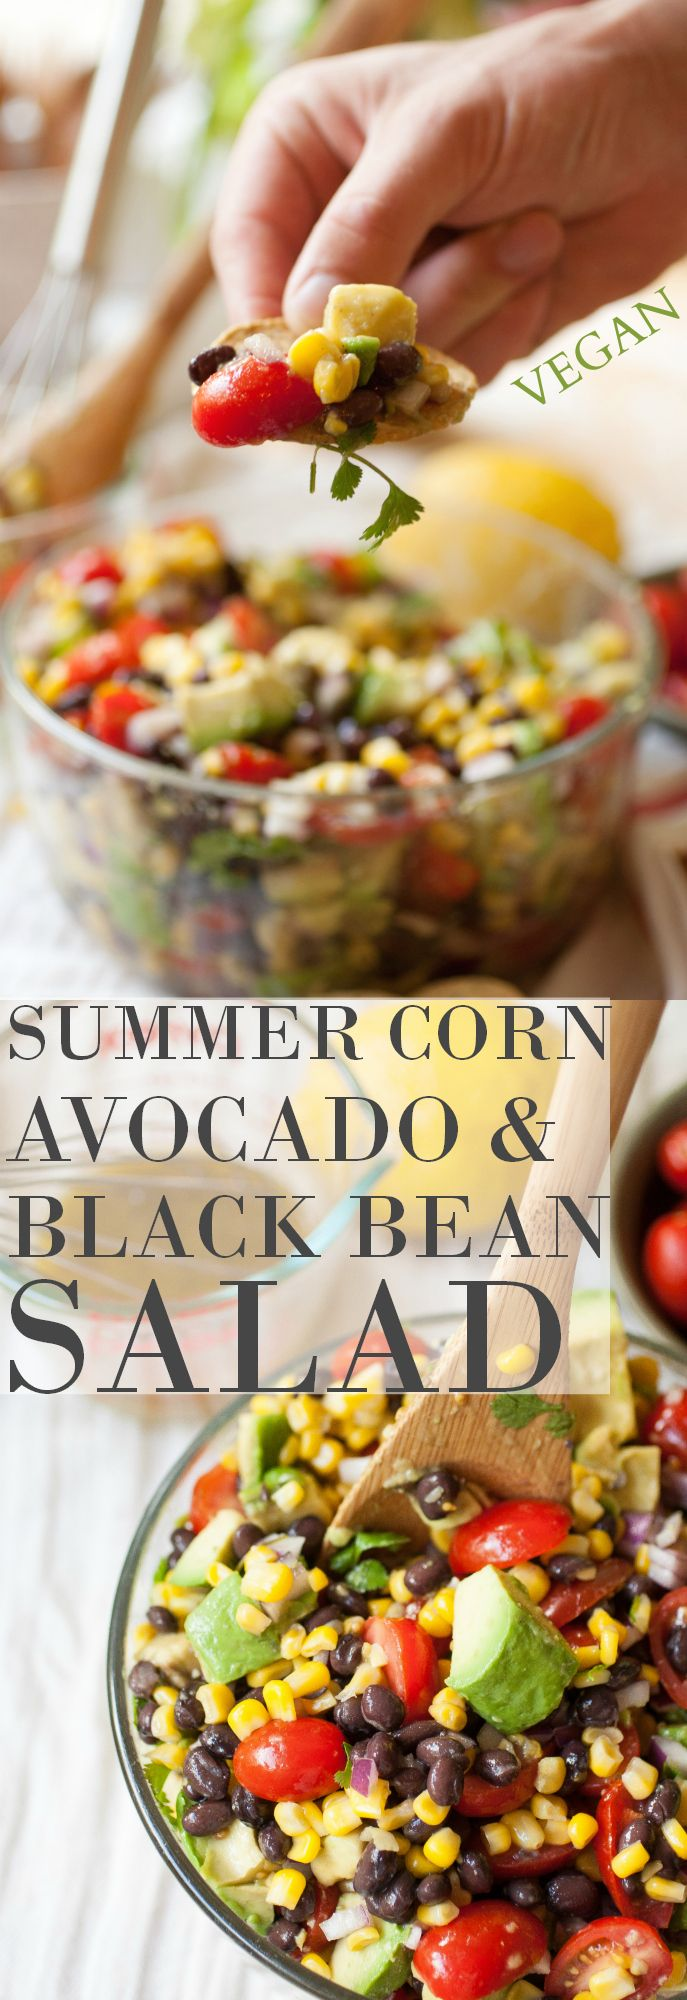 Produce On Parade - Summer Corn, Avocado Black Bean Salad